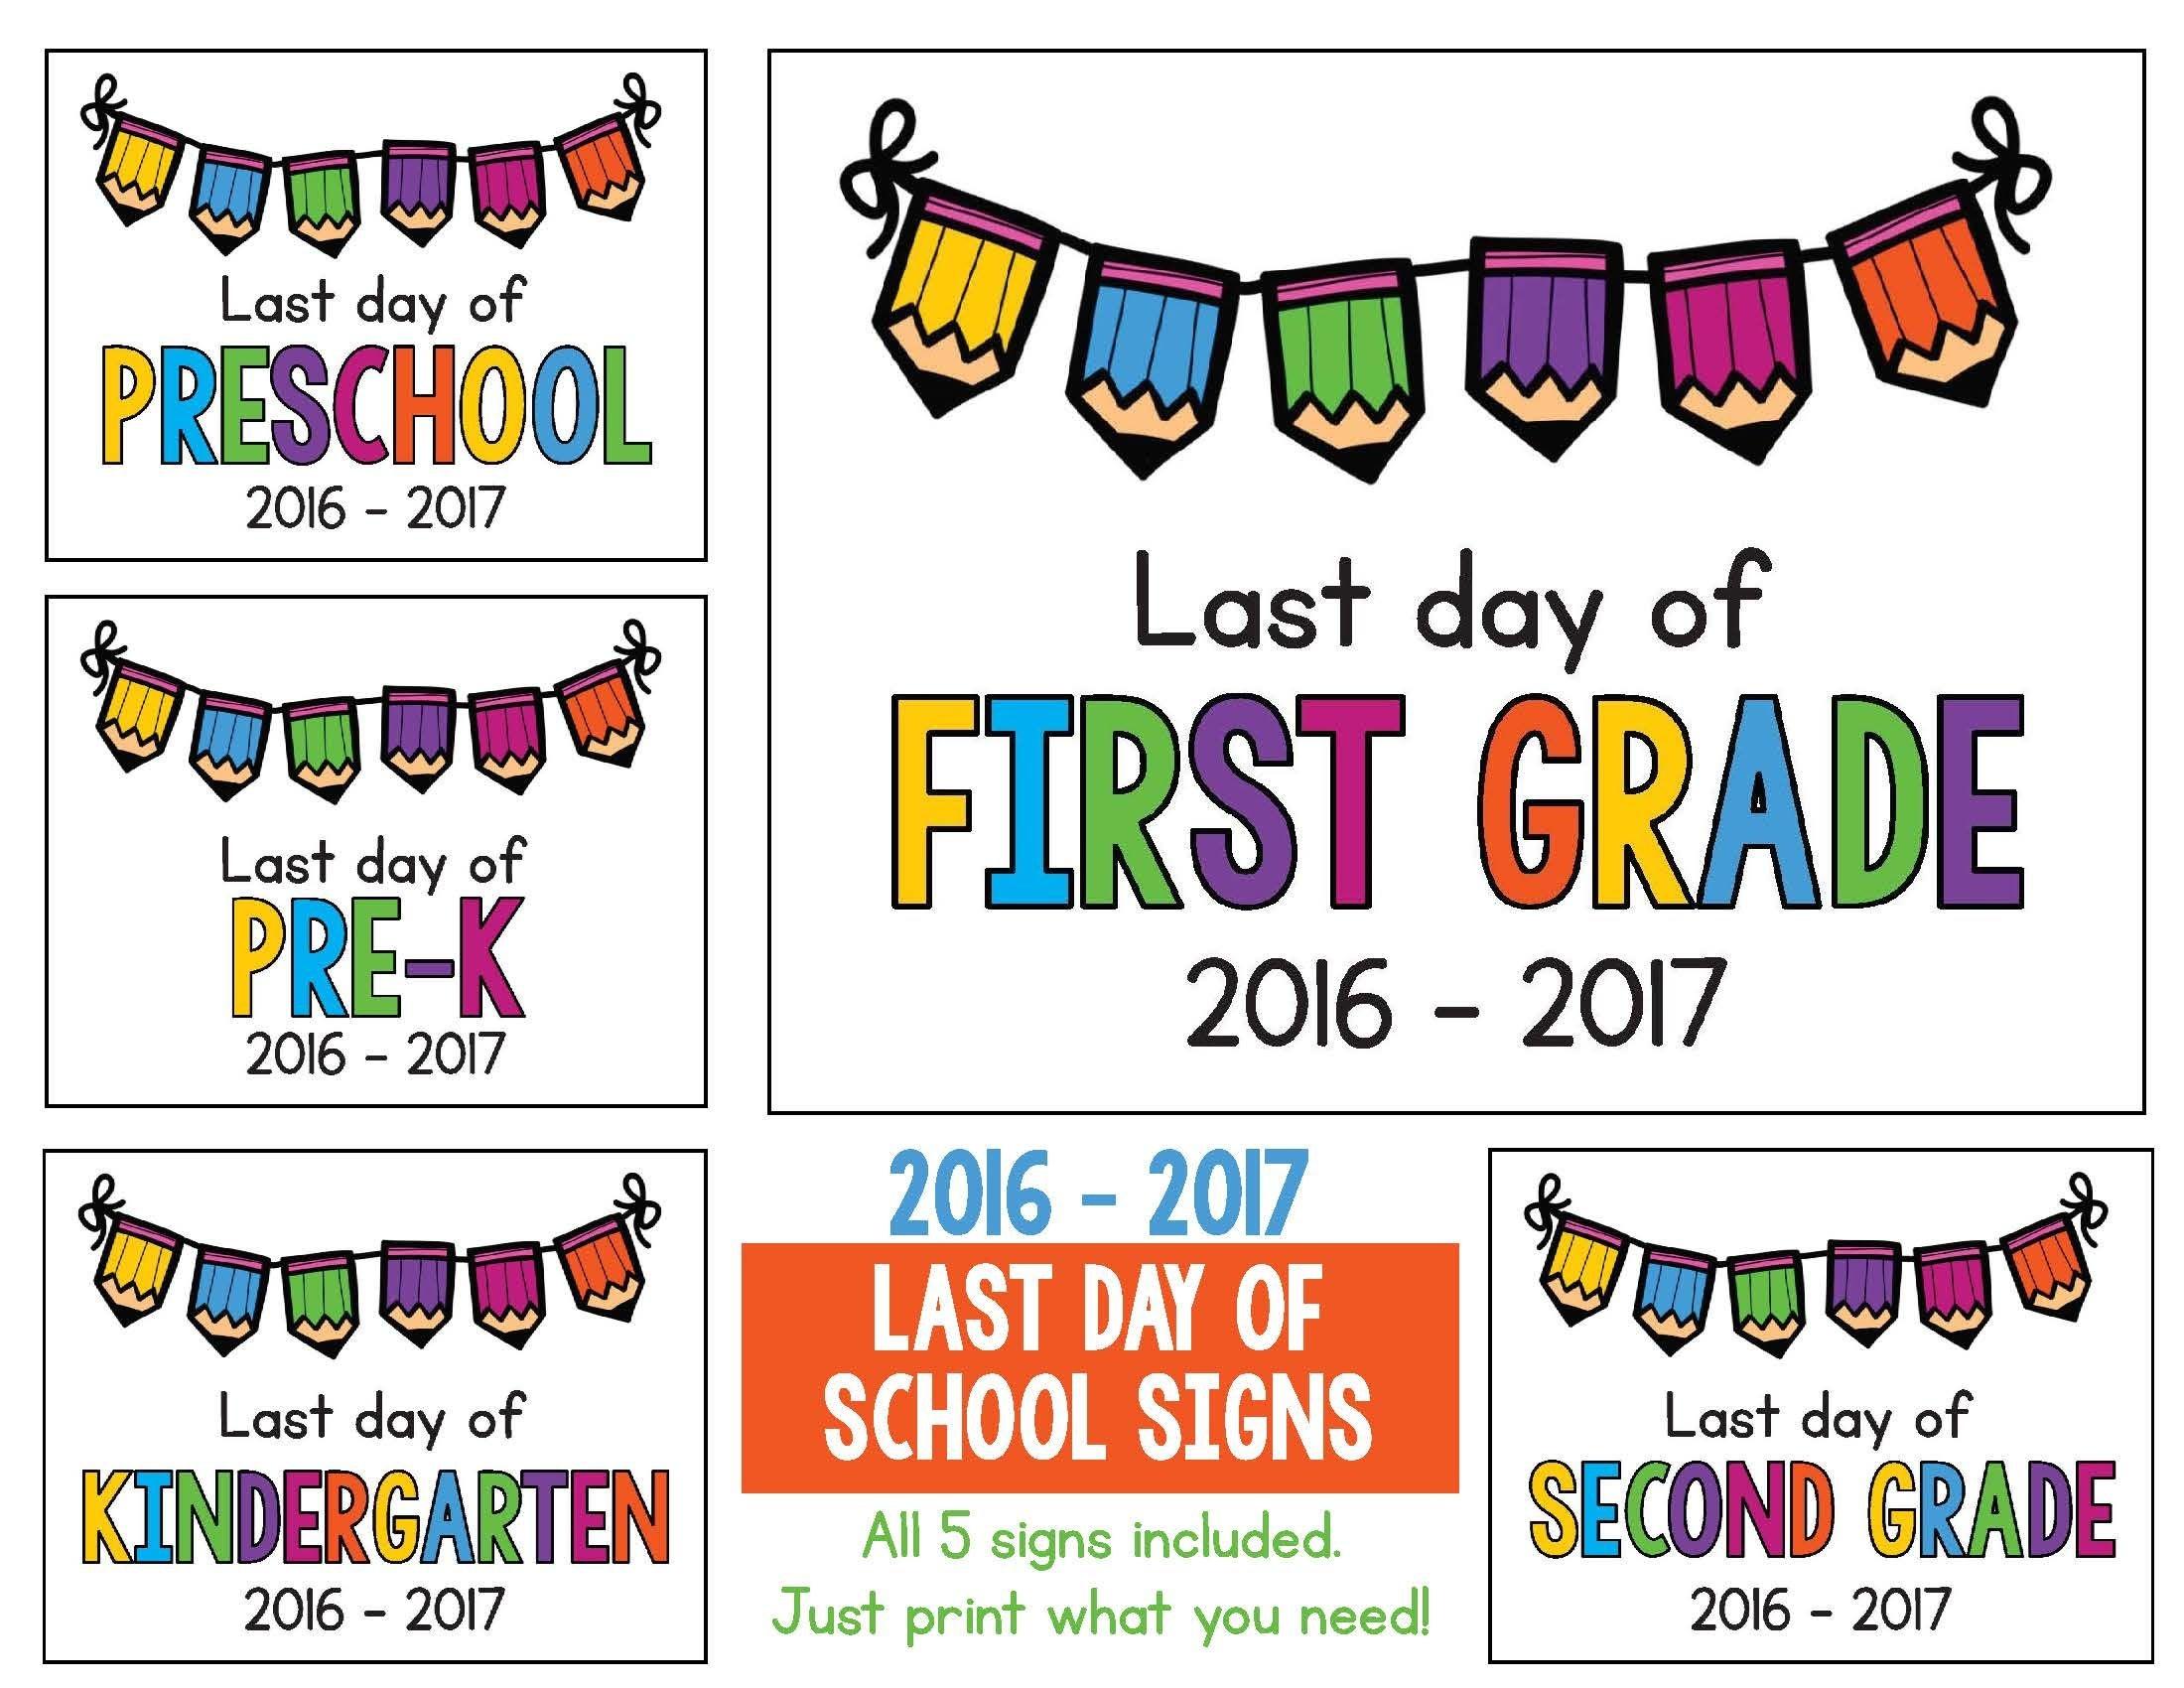 Last Day Of School Signs 2018 - 2019 Freebie: Preschool, Prek - Free Printable First Day Of School Signs 2017